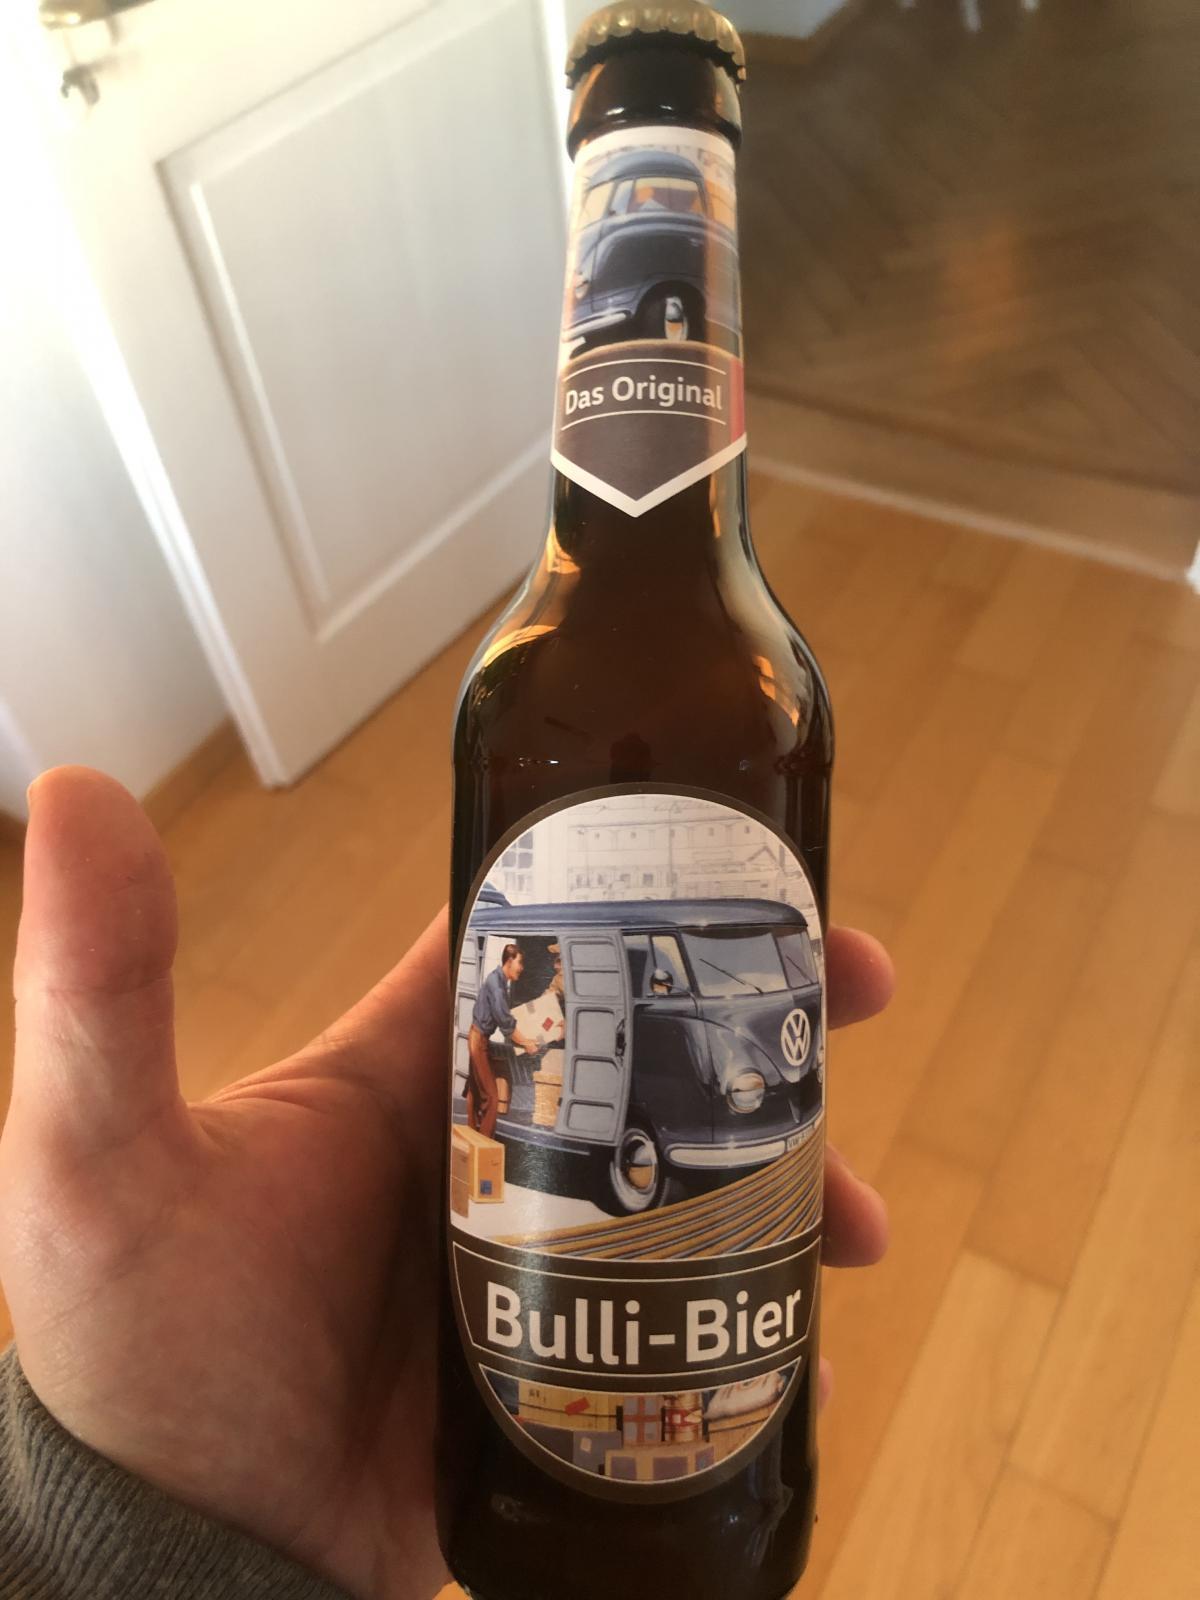 Bulli beer